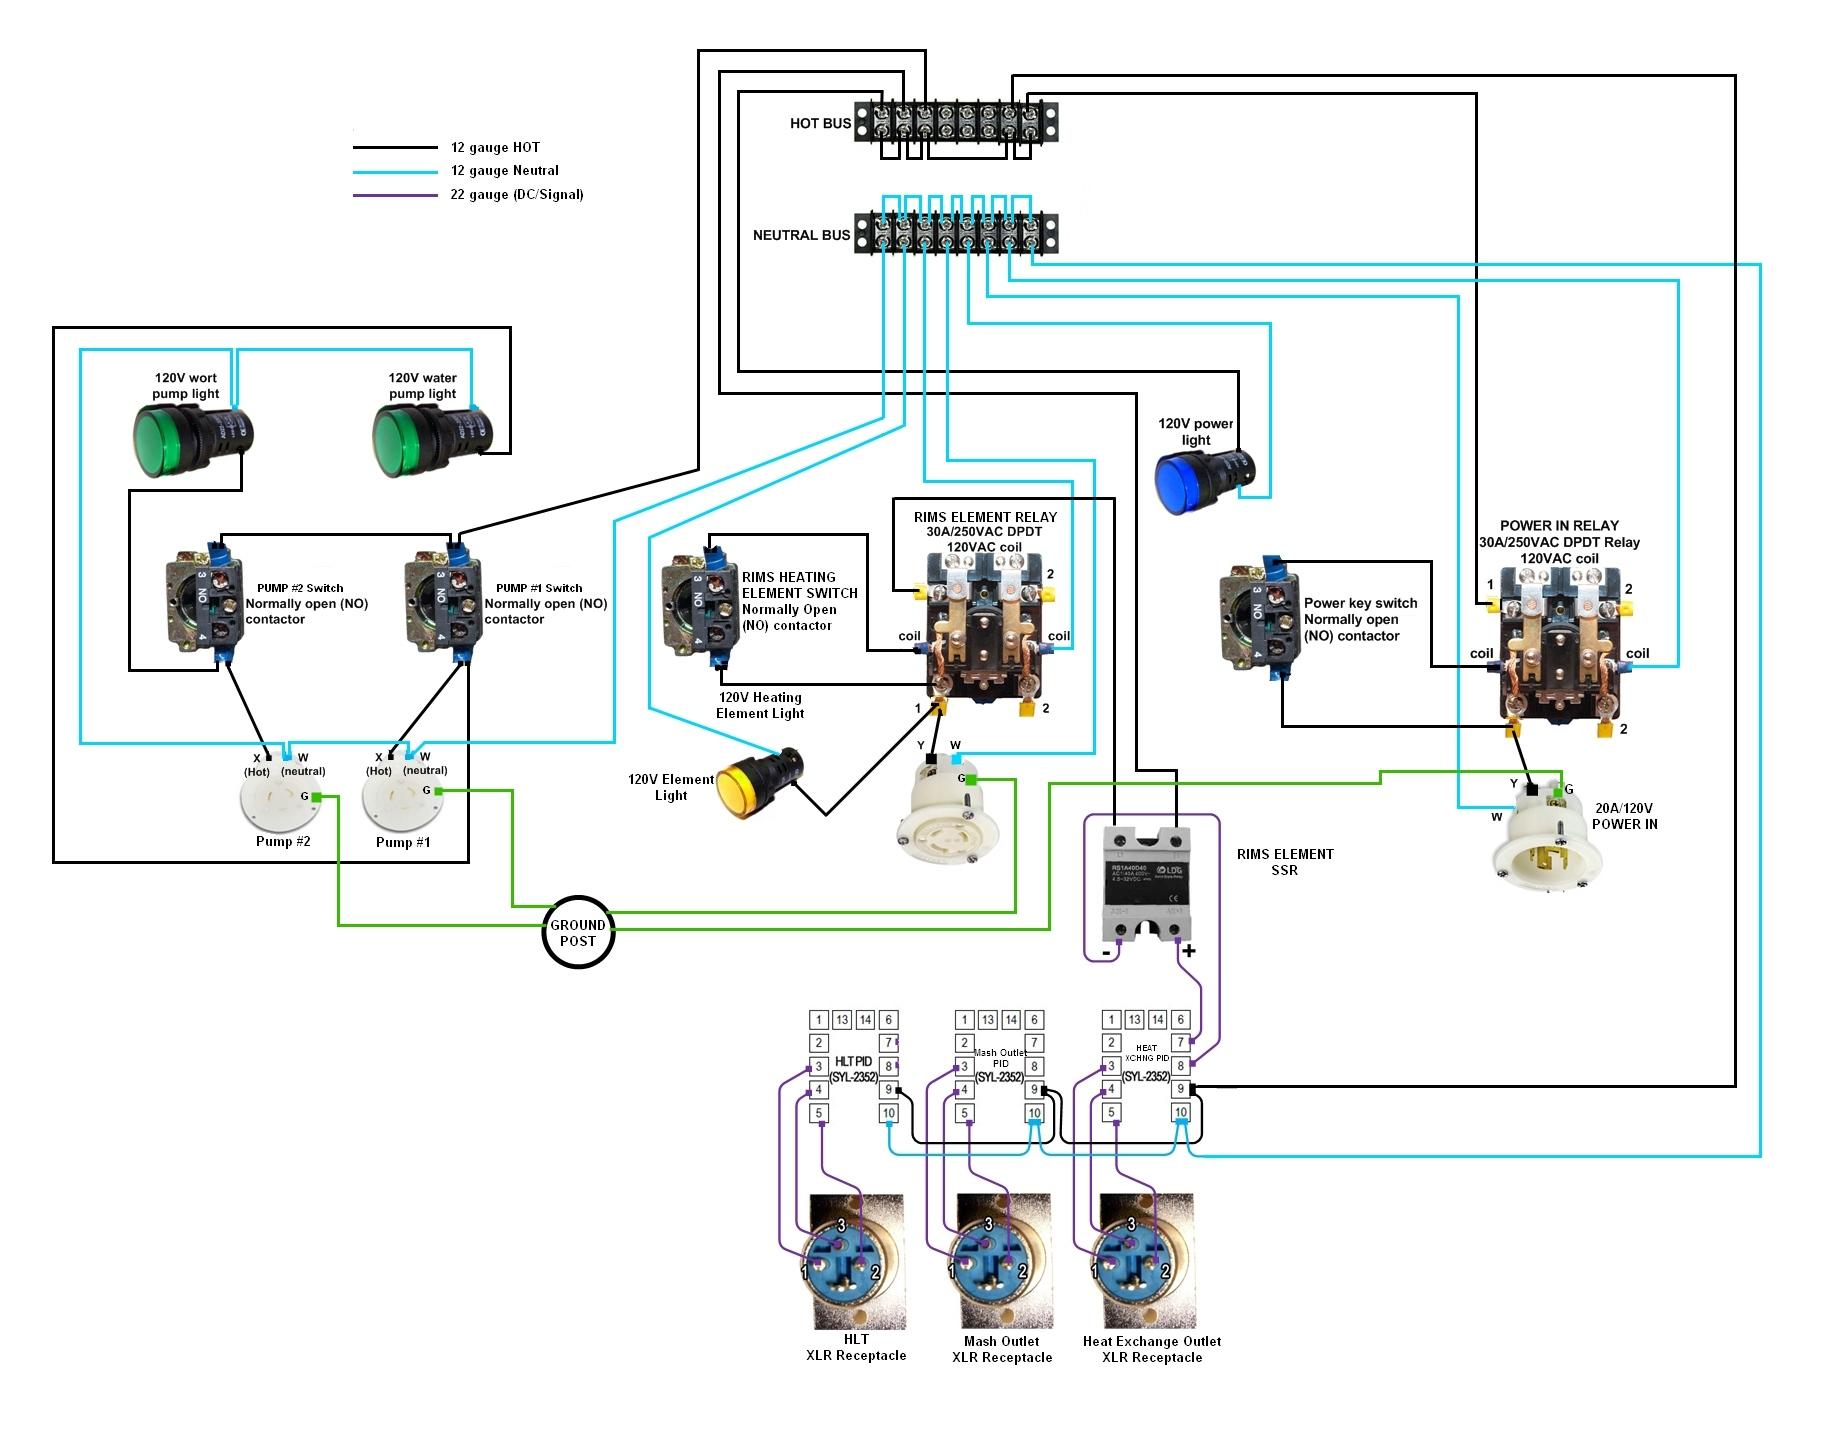 Relay Wiring Diagram Honeywell R8222u 1071 Free For Switching R845a Libraries Rh W38 Mo Stein De Ra832a